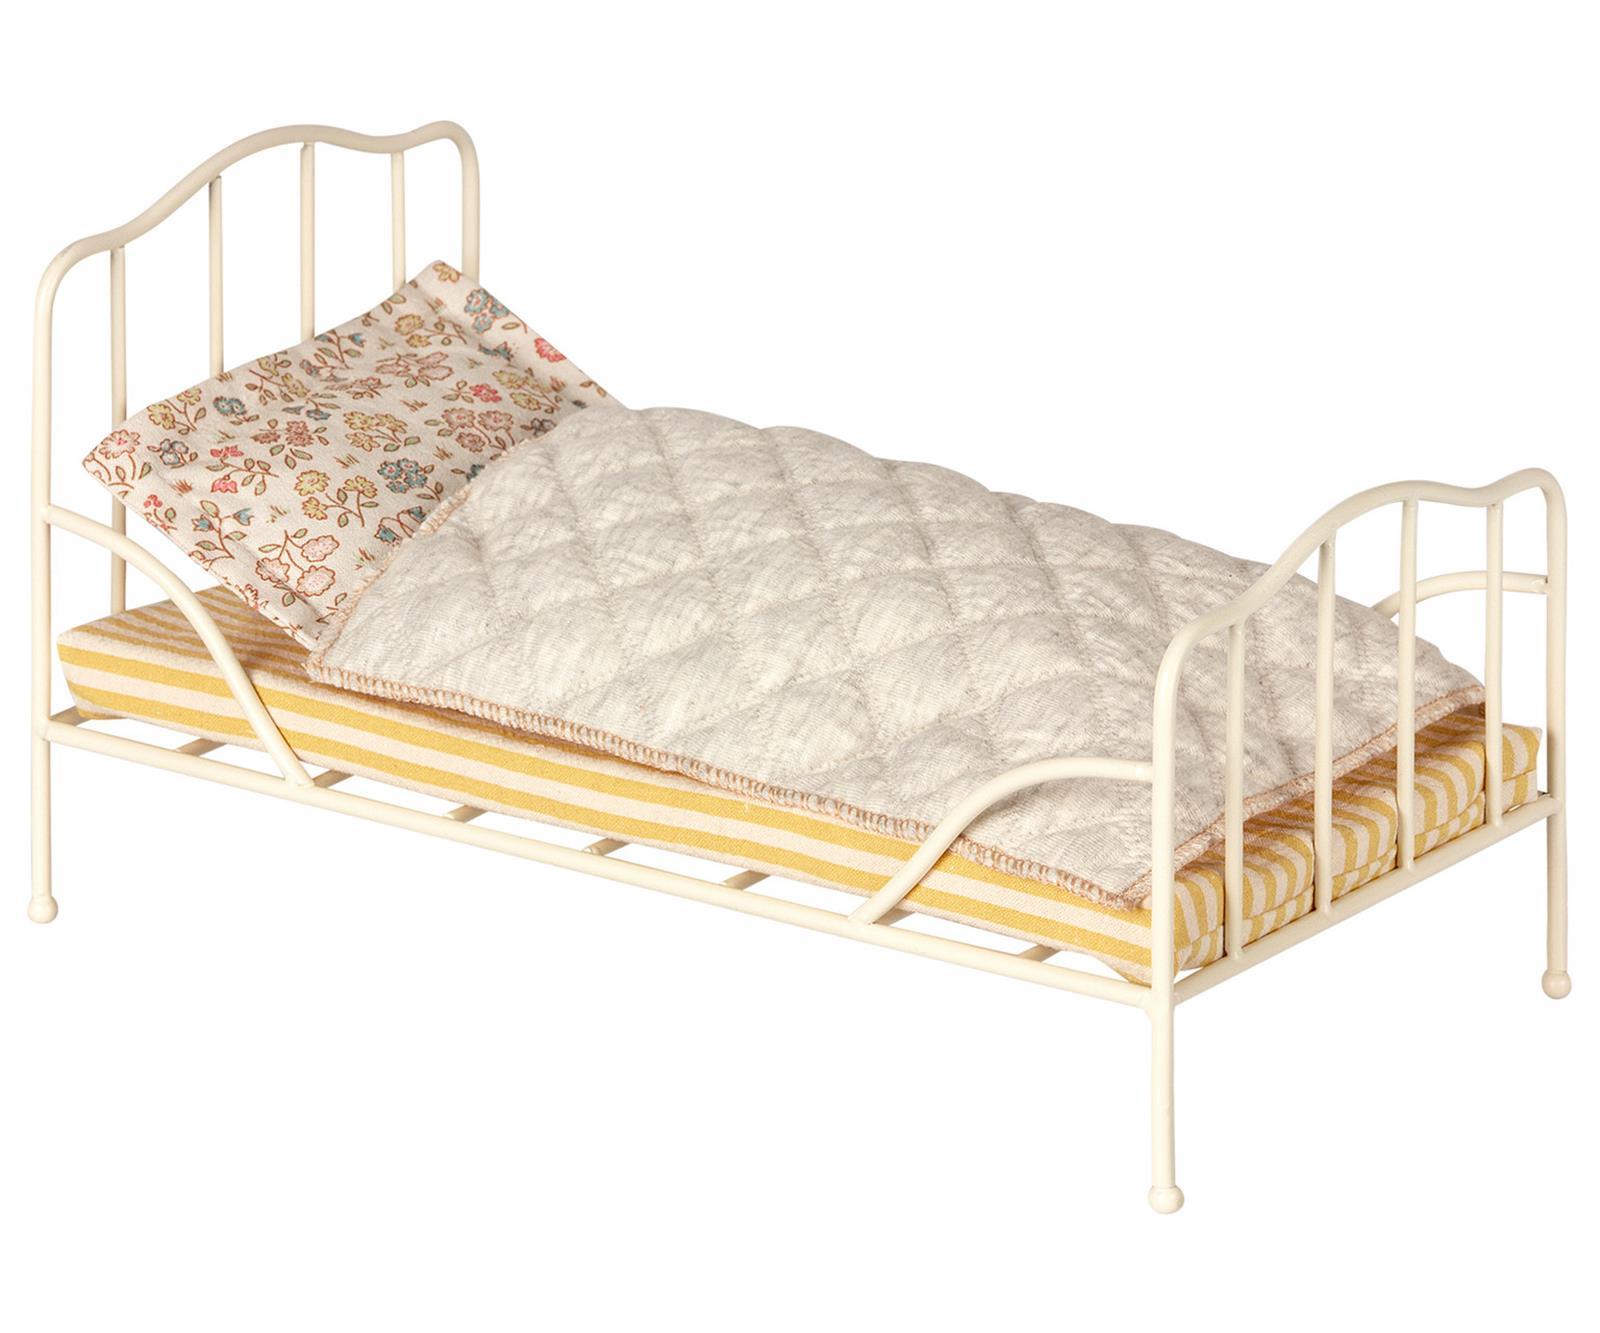 Full Size of Maileg Muse Puppenbett Bett Bed Mini Off White Mit Bettkasten 140x200 Aufbewahrung Hoch Ruf 80x200 2m X Flexa Betten Funktions Rauch Stauraum Rückenlehne Bett Bett Vintage